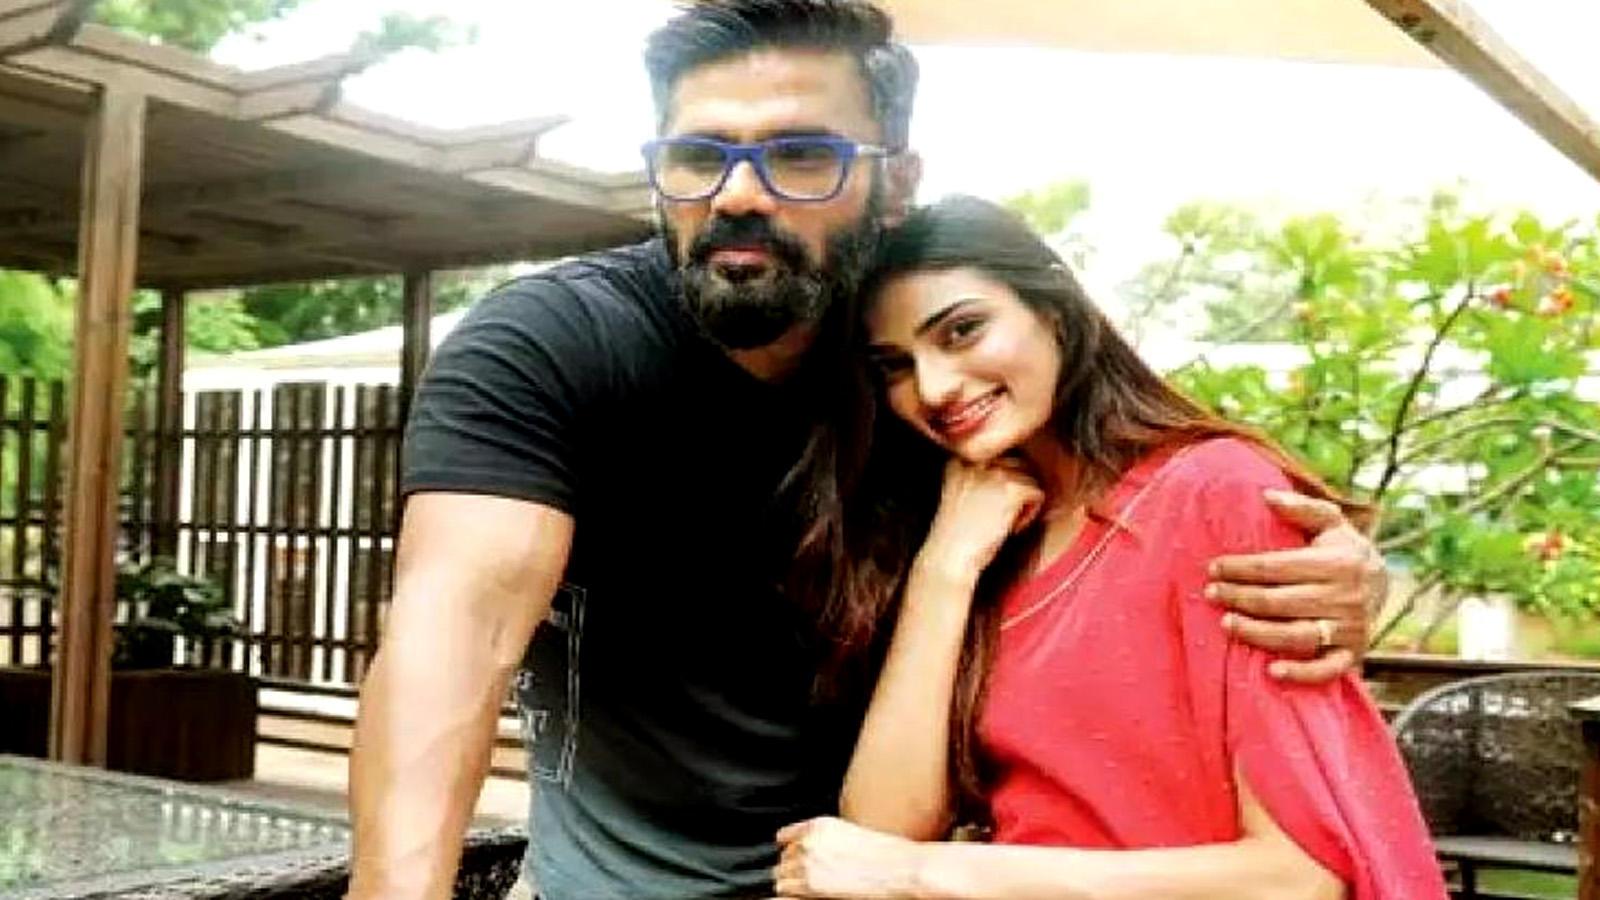 Suniel Shetty accused of interfering with daughter Athiya Shetty's upcoming film 'Motichoor Chaknachoor'